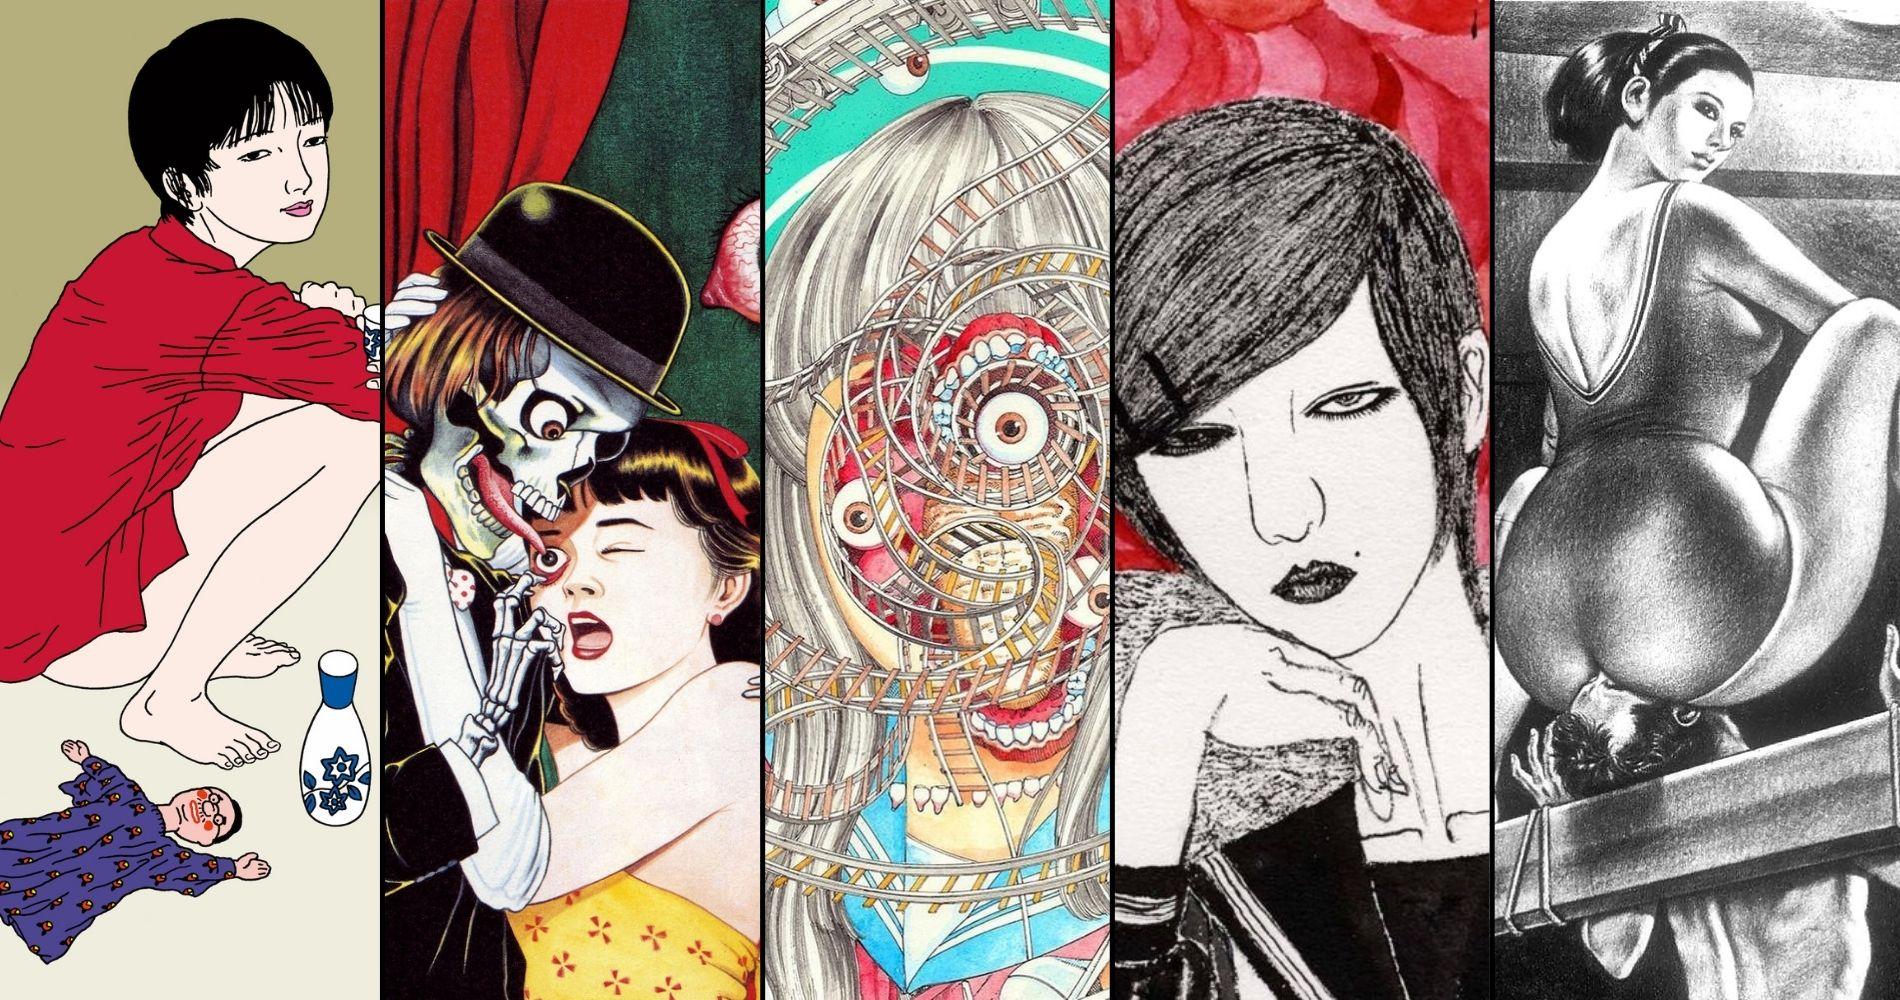 Japanese Erotic Grotesque Art: 5 Definitive Figures